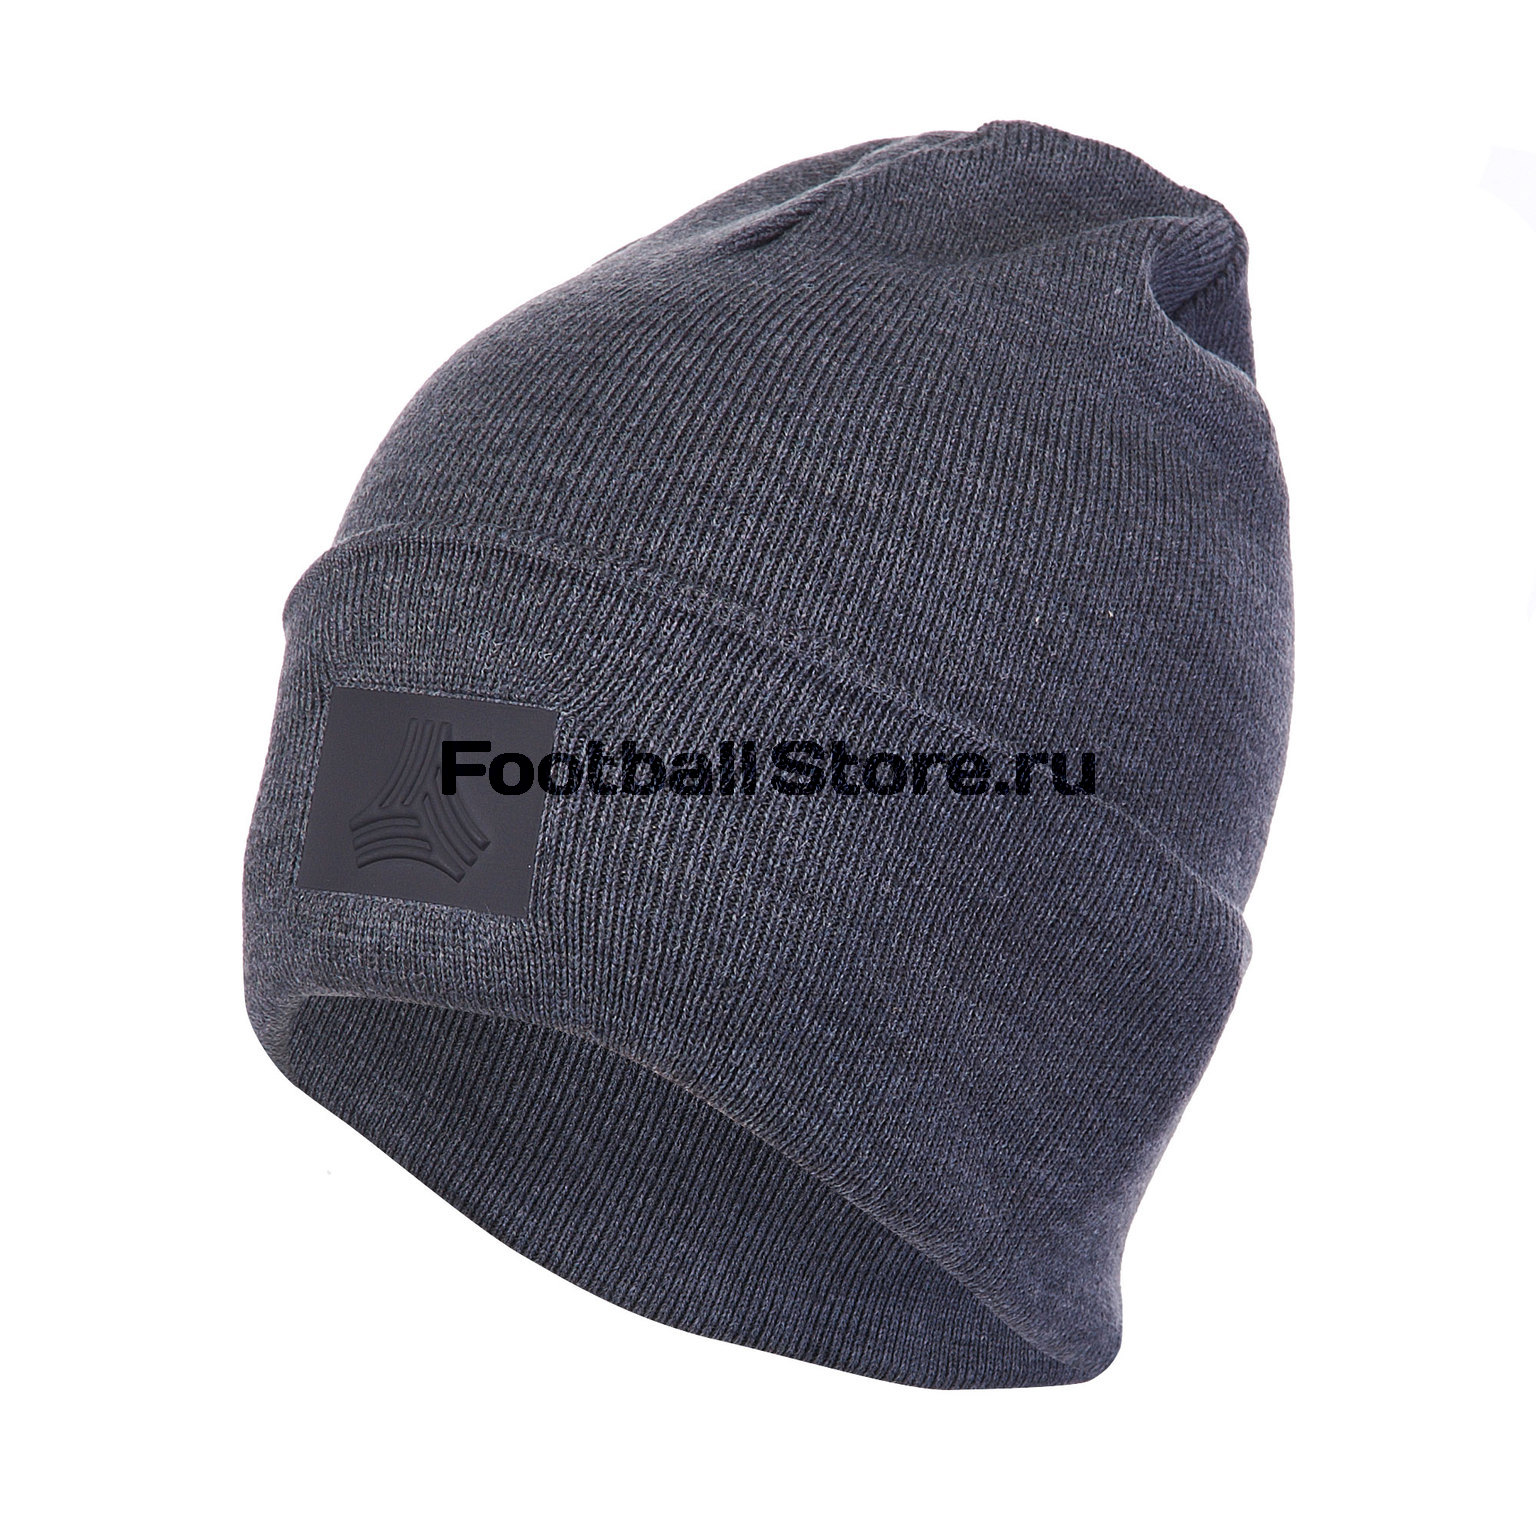 Шапка Adidas FS Woolie DM7169 рюкзак adidas fs bp cf3329